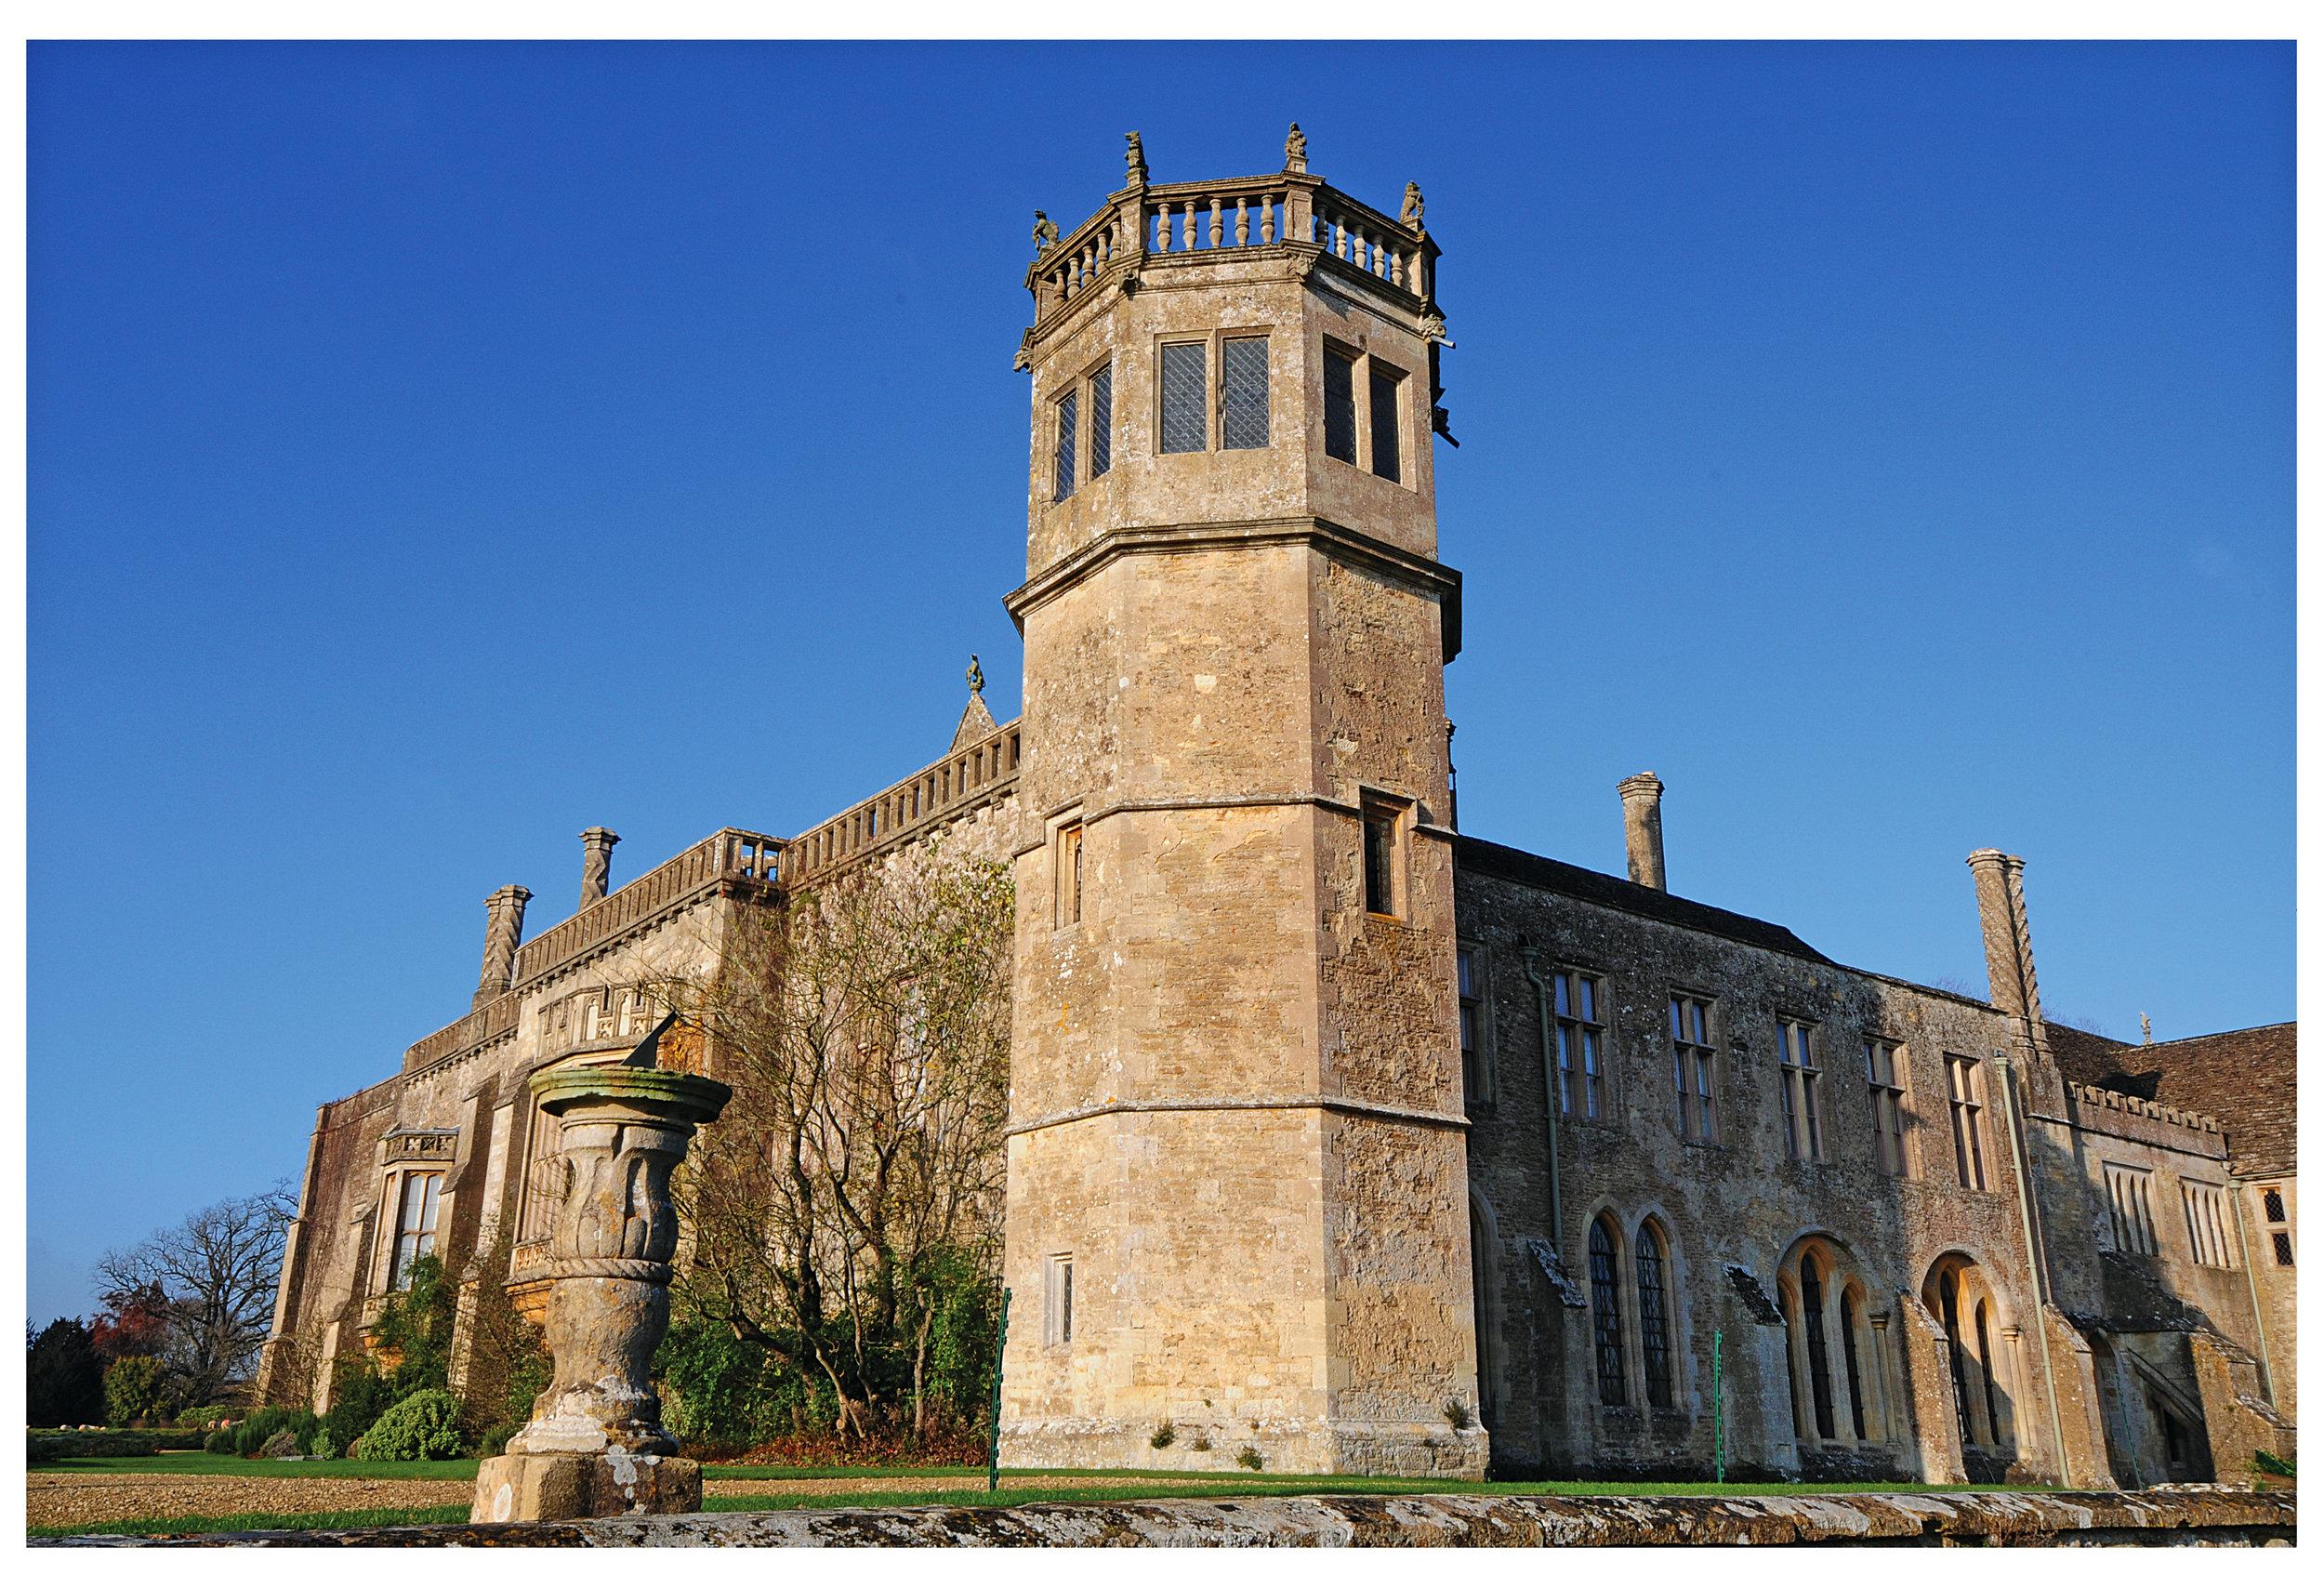 Lacock Abbey, Lacock, Wilts., England.jpg